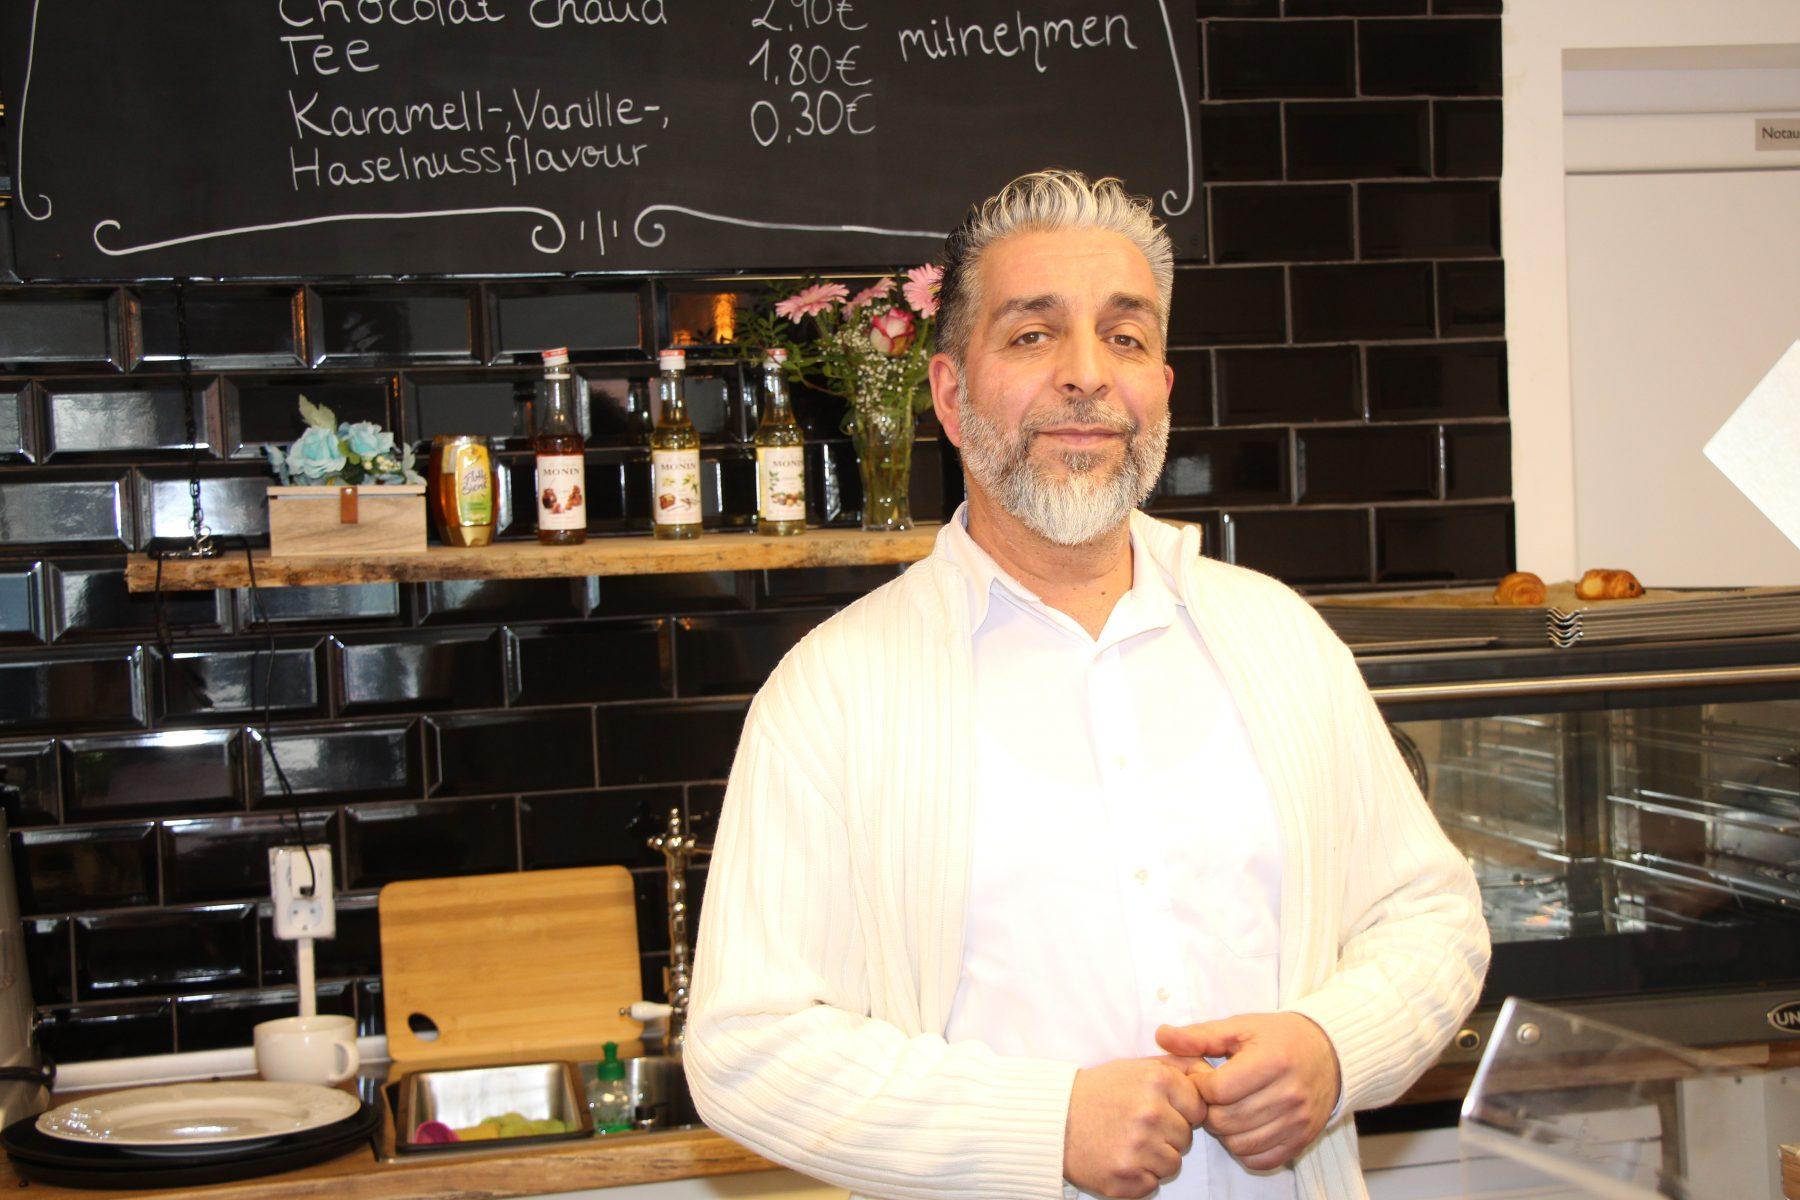 Inhaber Halim Naim in La Petite Boulangerie. Foto: Sophia Kleiner